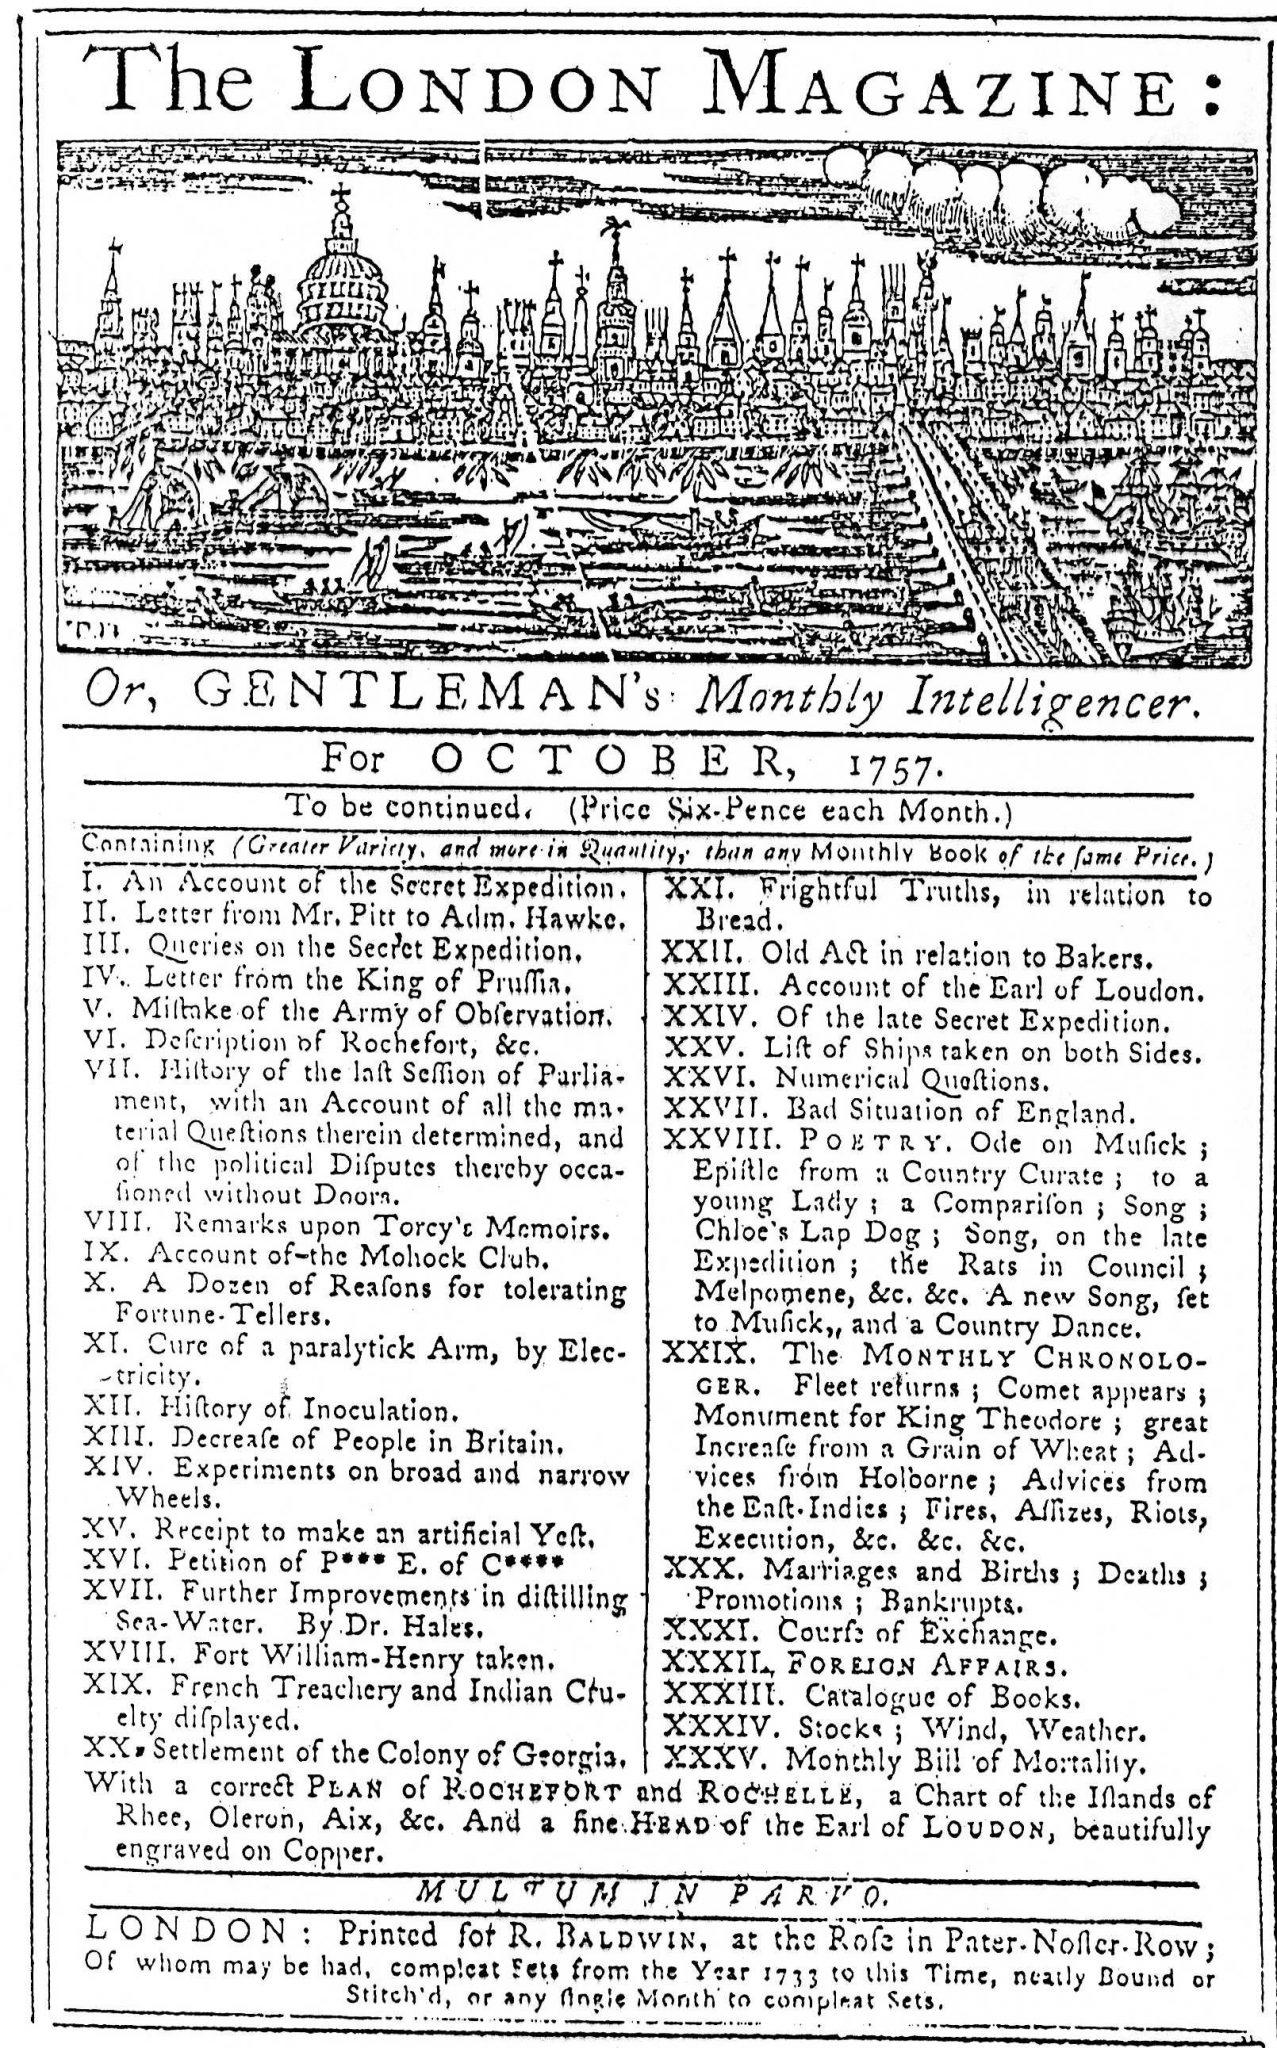 London Magazine for October, 1757